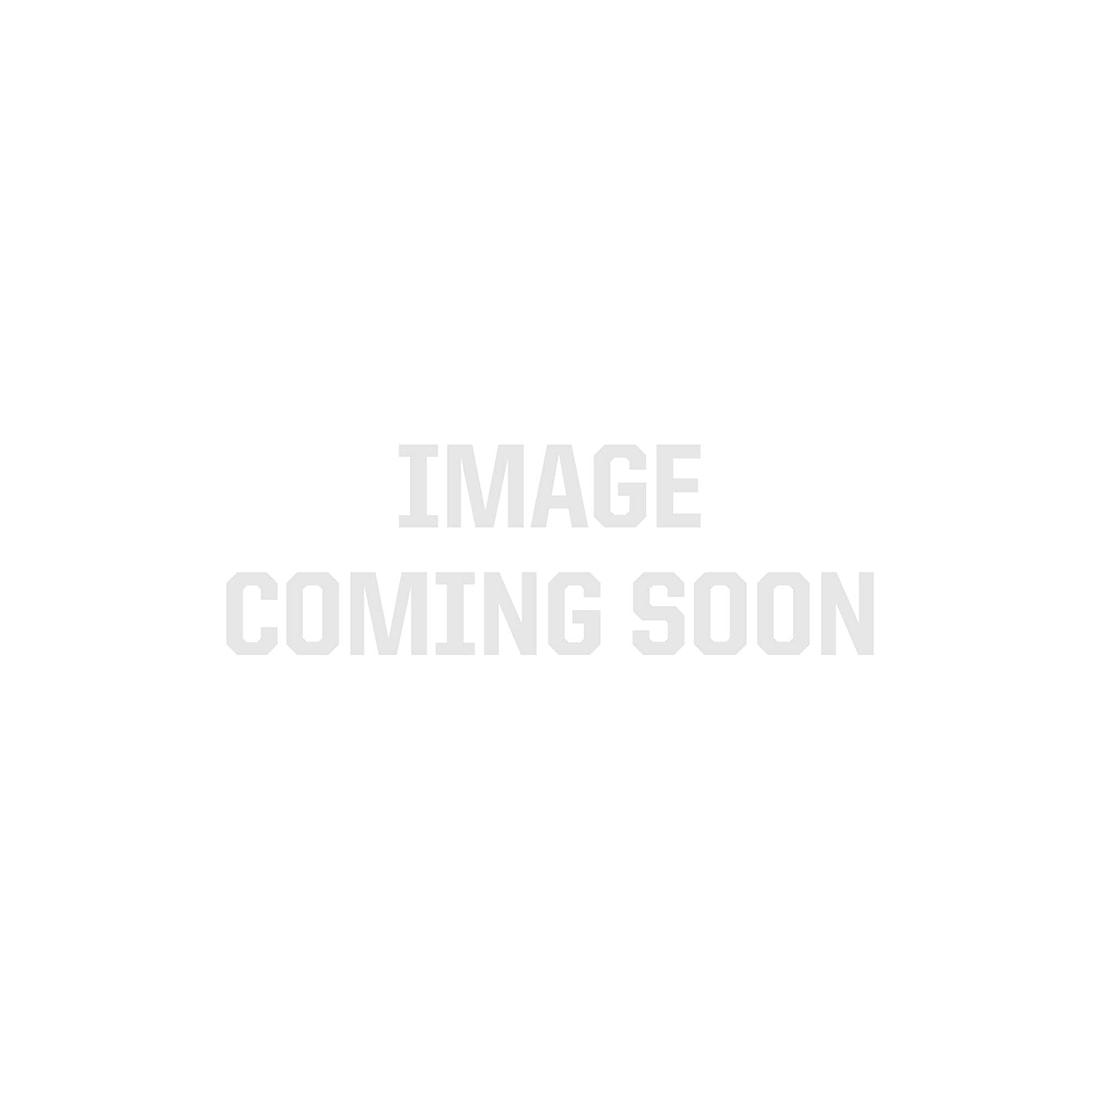 Lutron CTCL-153P Skylark Contour Dimmable CFL/LED Dimmer; 150 Watt, Single Pole or 3-Way (Multi-location) Almond